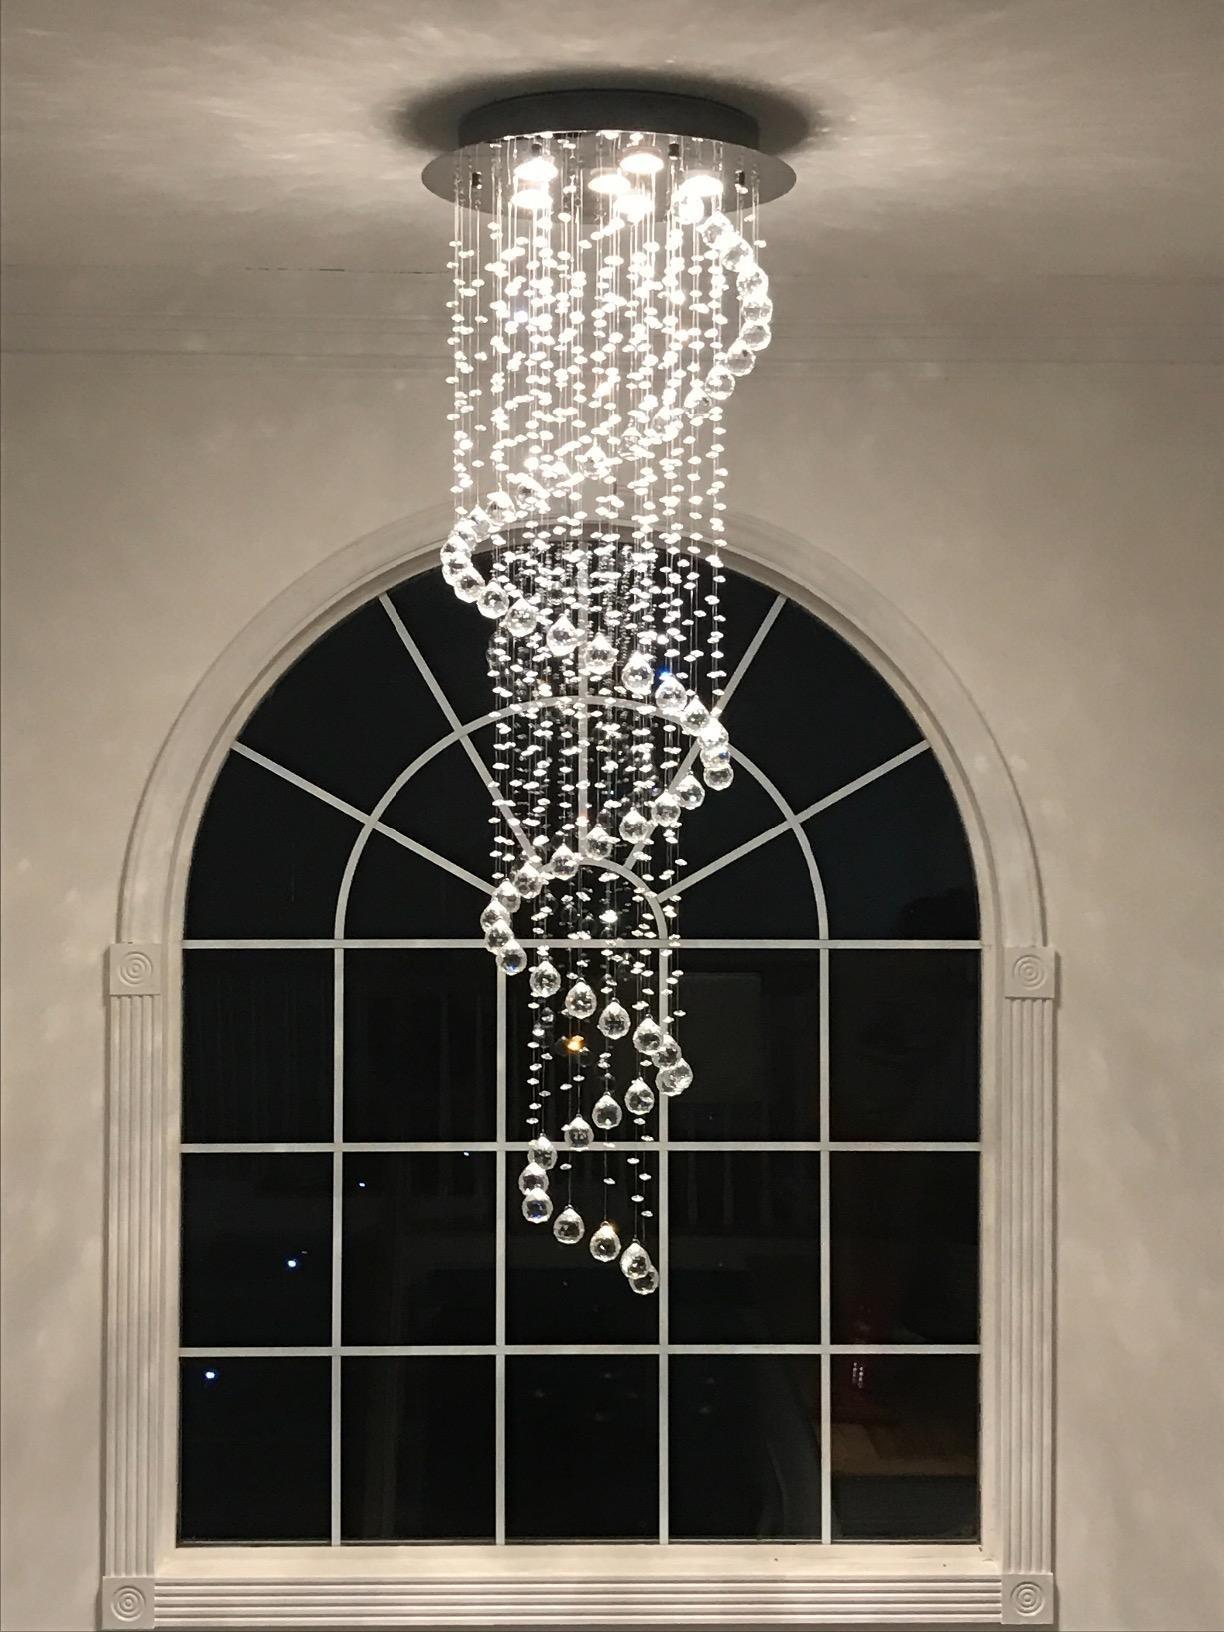 Crystal Chandeliers Spiral Sphere Rain Drop Spectacular Ceiling Lighting Flush Mount Fixture Chandelier, Crystal Ball Ceiling Light for Living Room Hotel Hallway Foyer Entry Way Romantic (NF-9027-6)